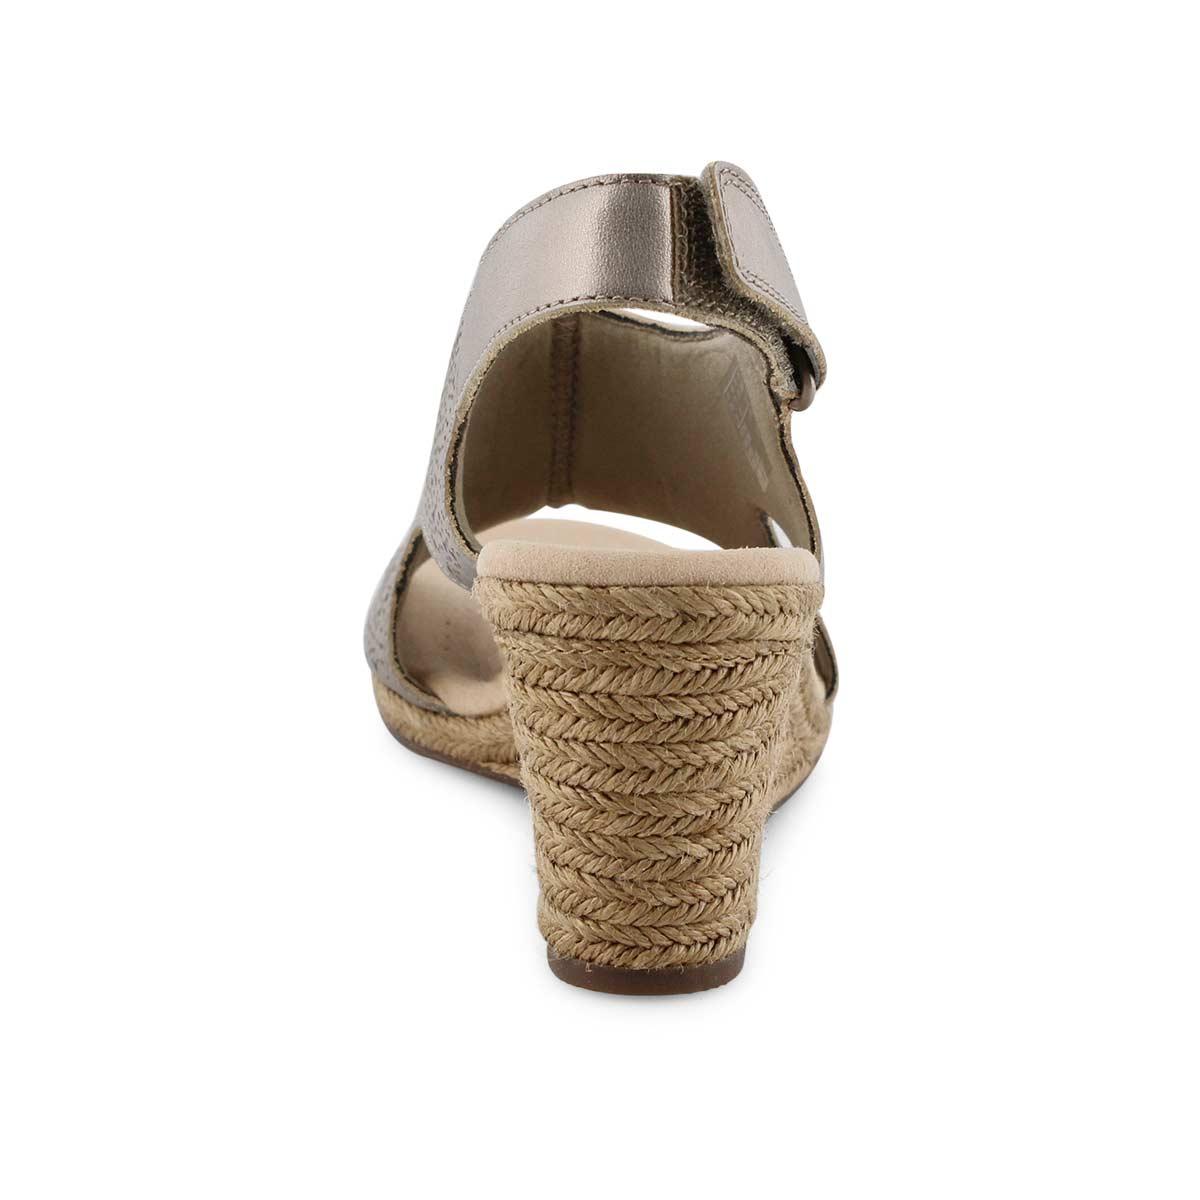 Lds Lafley Rosen pewter wedge sandal